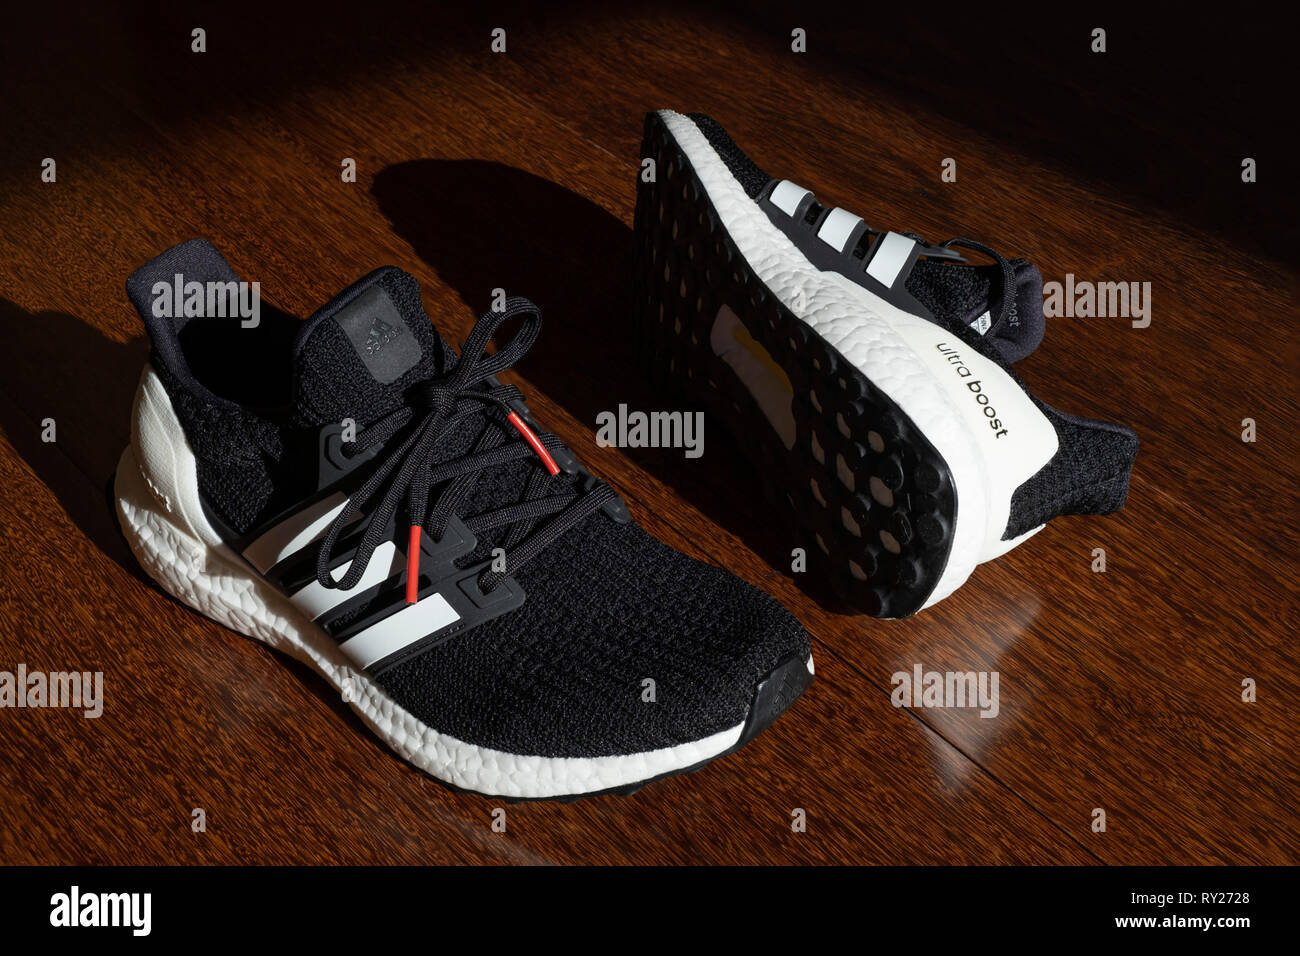 c1c9d16b Negro Ultraboost adidas zapatos para correr sobre piso de madera Imagen De  Stock